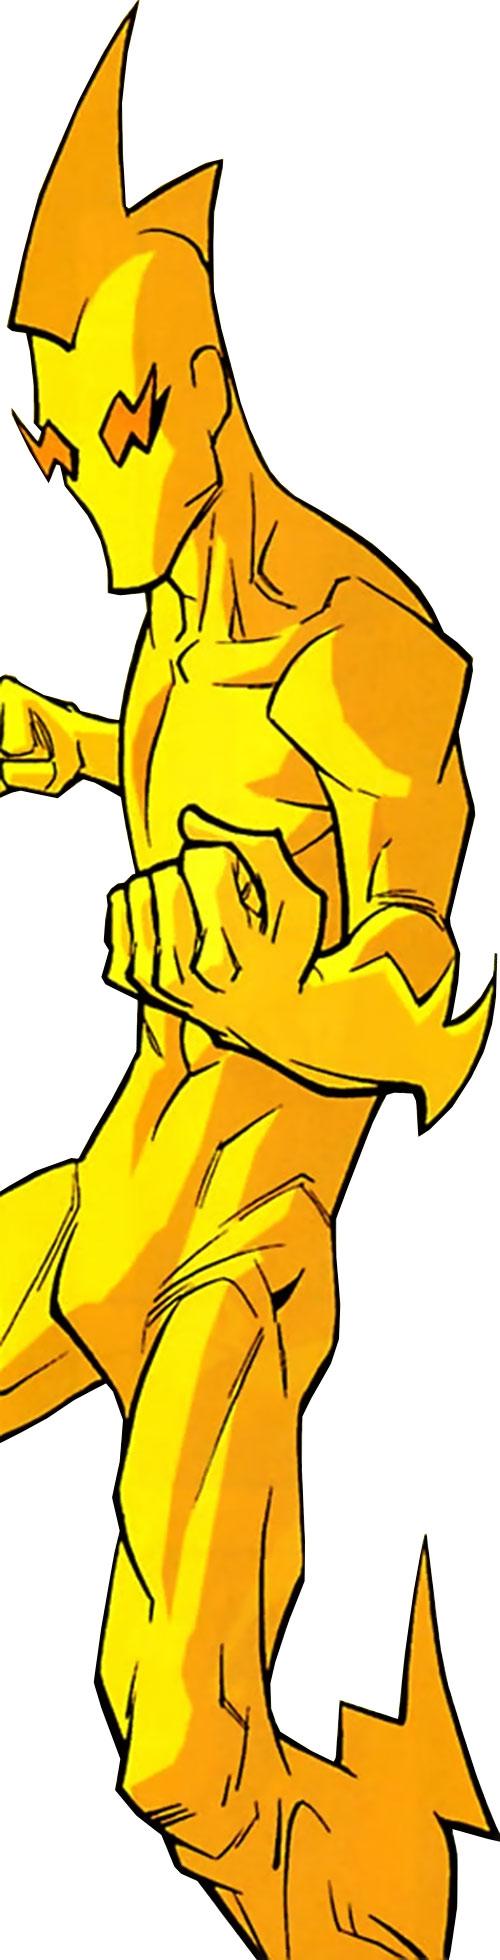 Kursk (Invincible enemy) (Image Comics)